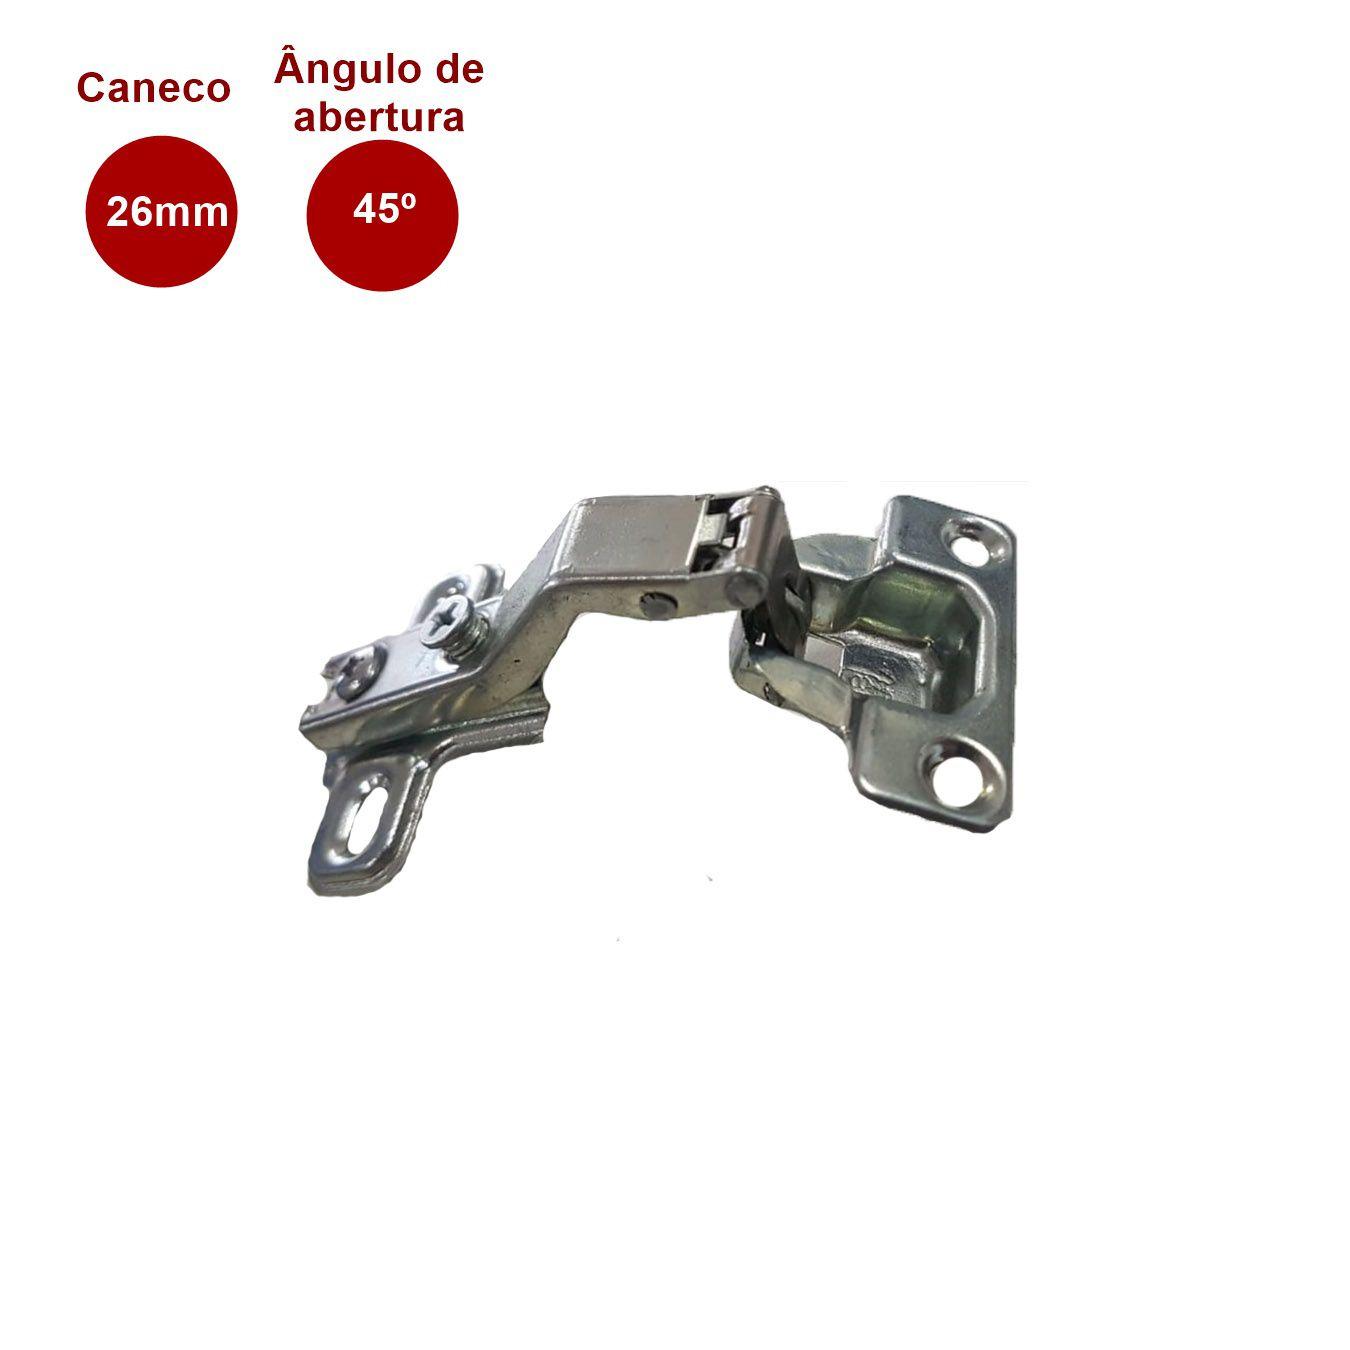 Mini Dobradiça 45° Caneco 26mm